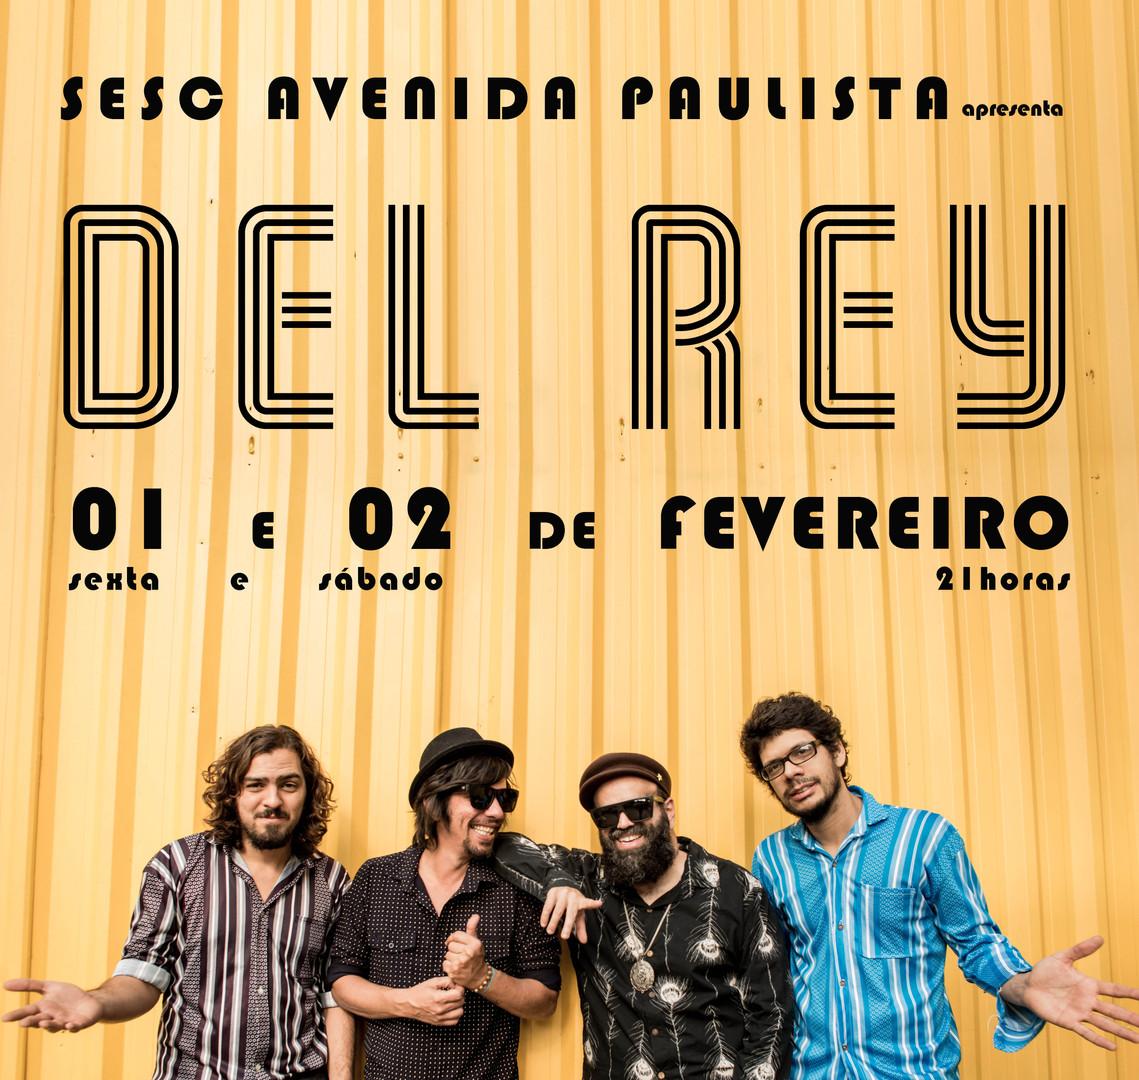 Del Rey @ Sesc Avenida Paulista